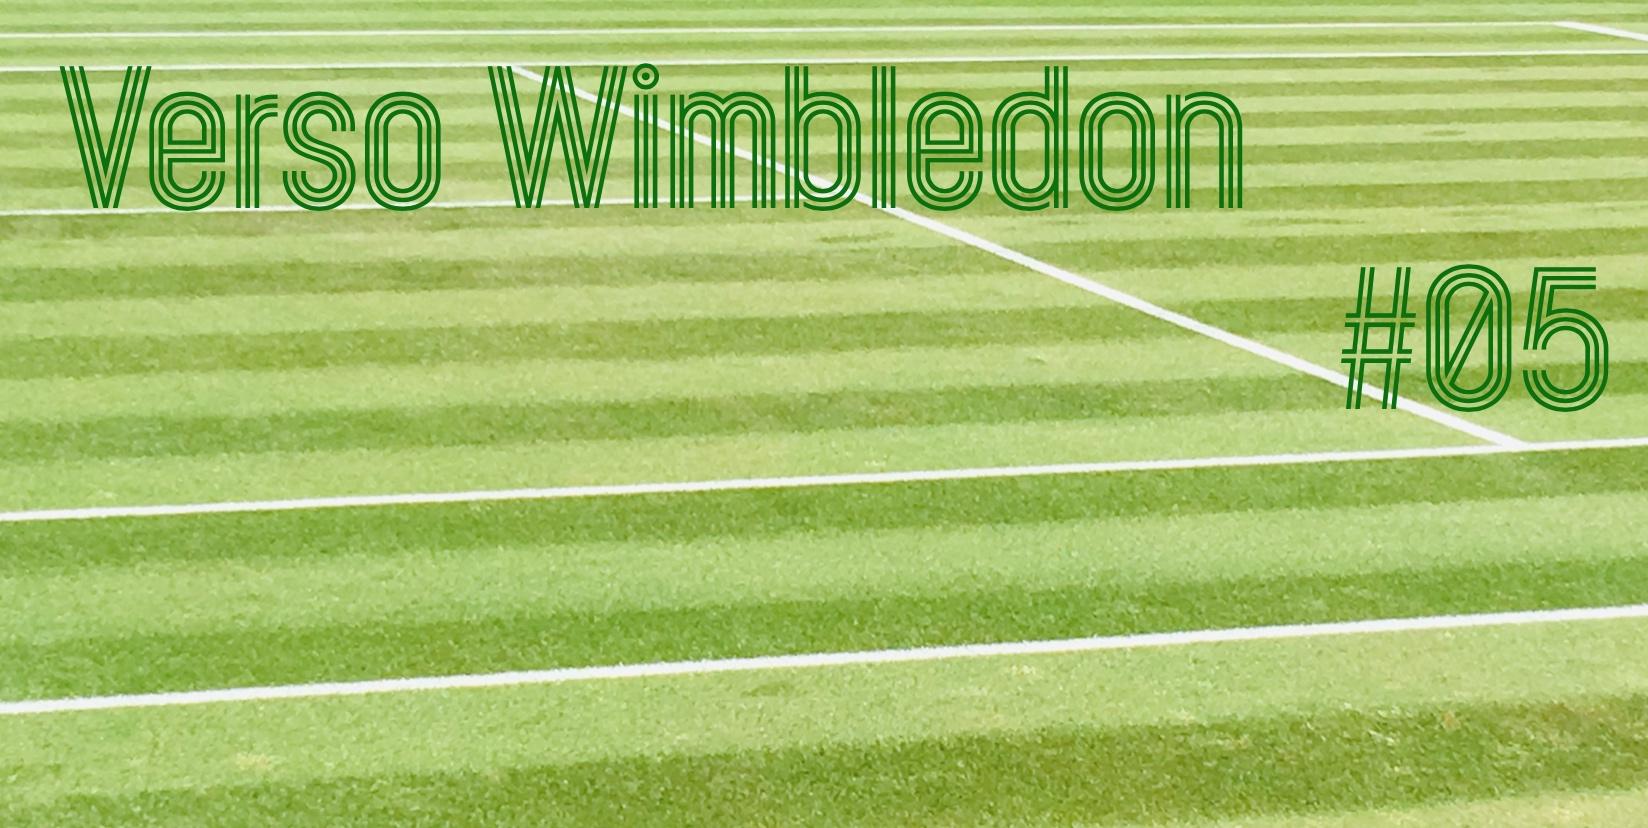 Verso Wimbledon #5 - settesei.it